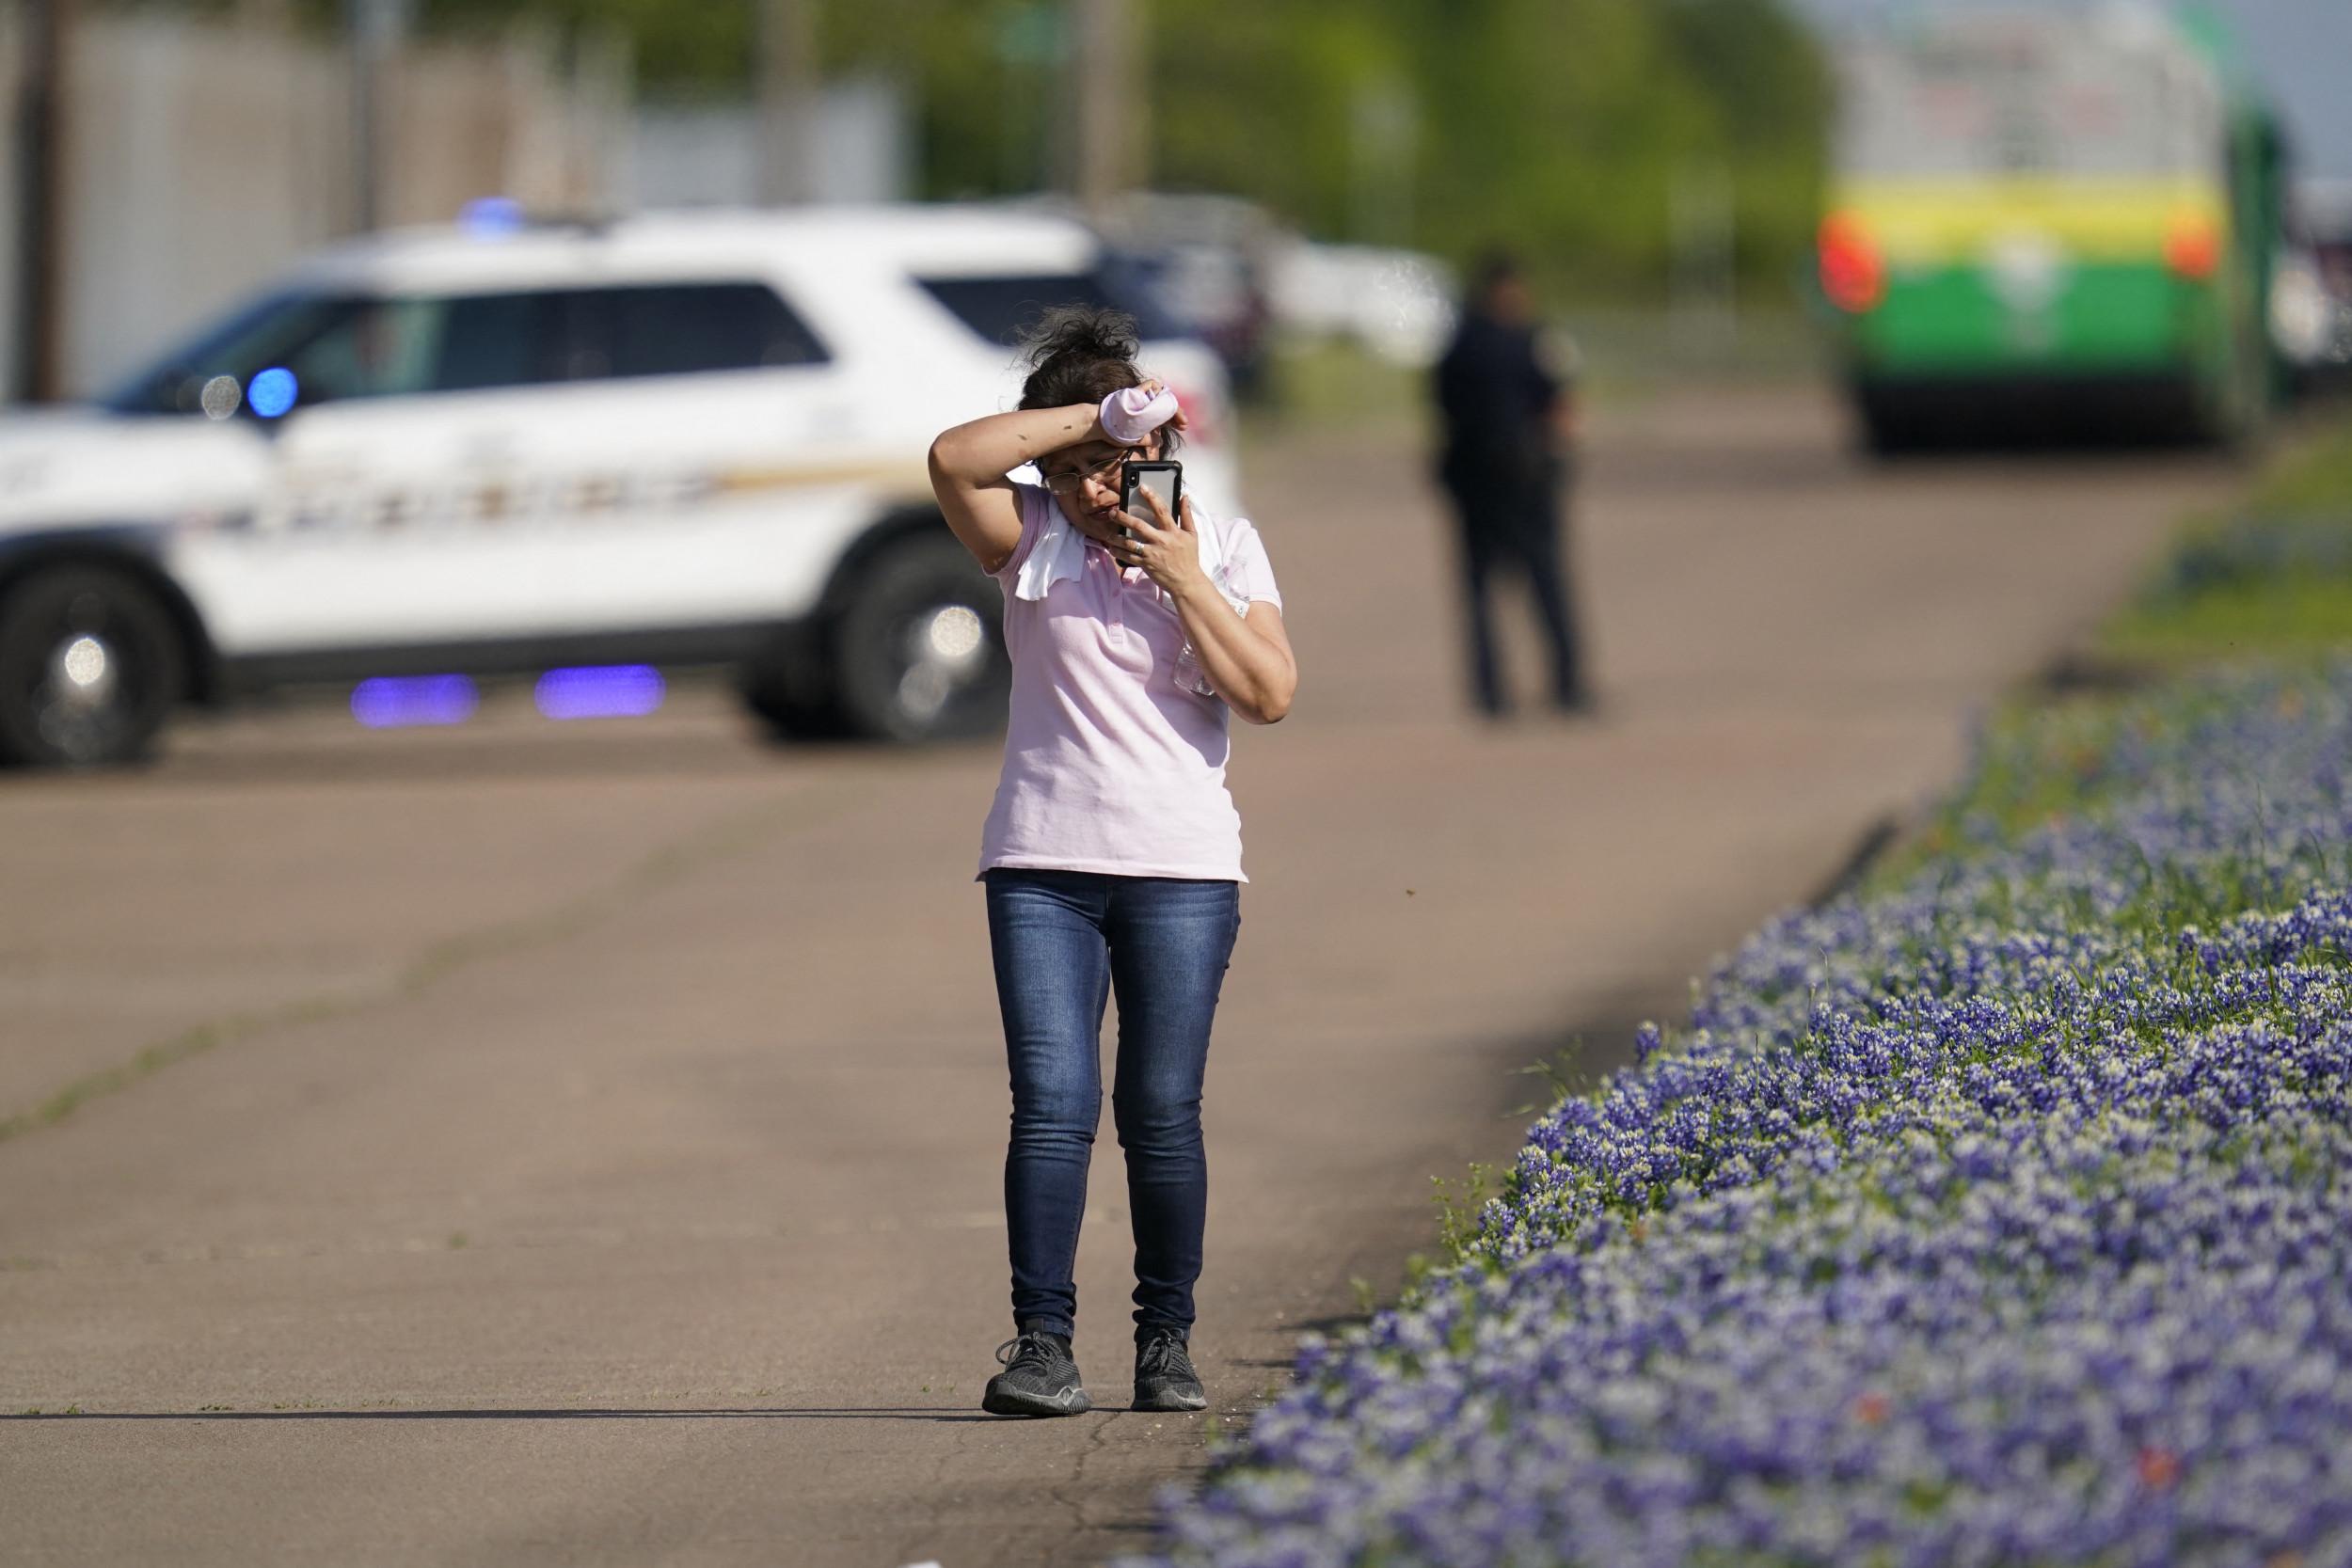 Texas GOP Lawmaker's Pro-Gun Tweet After Austin Shooting Draws Backlash